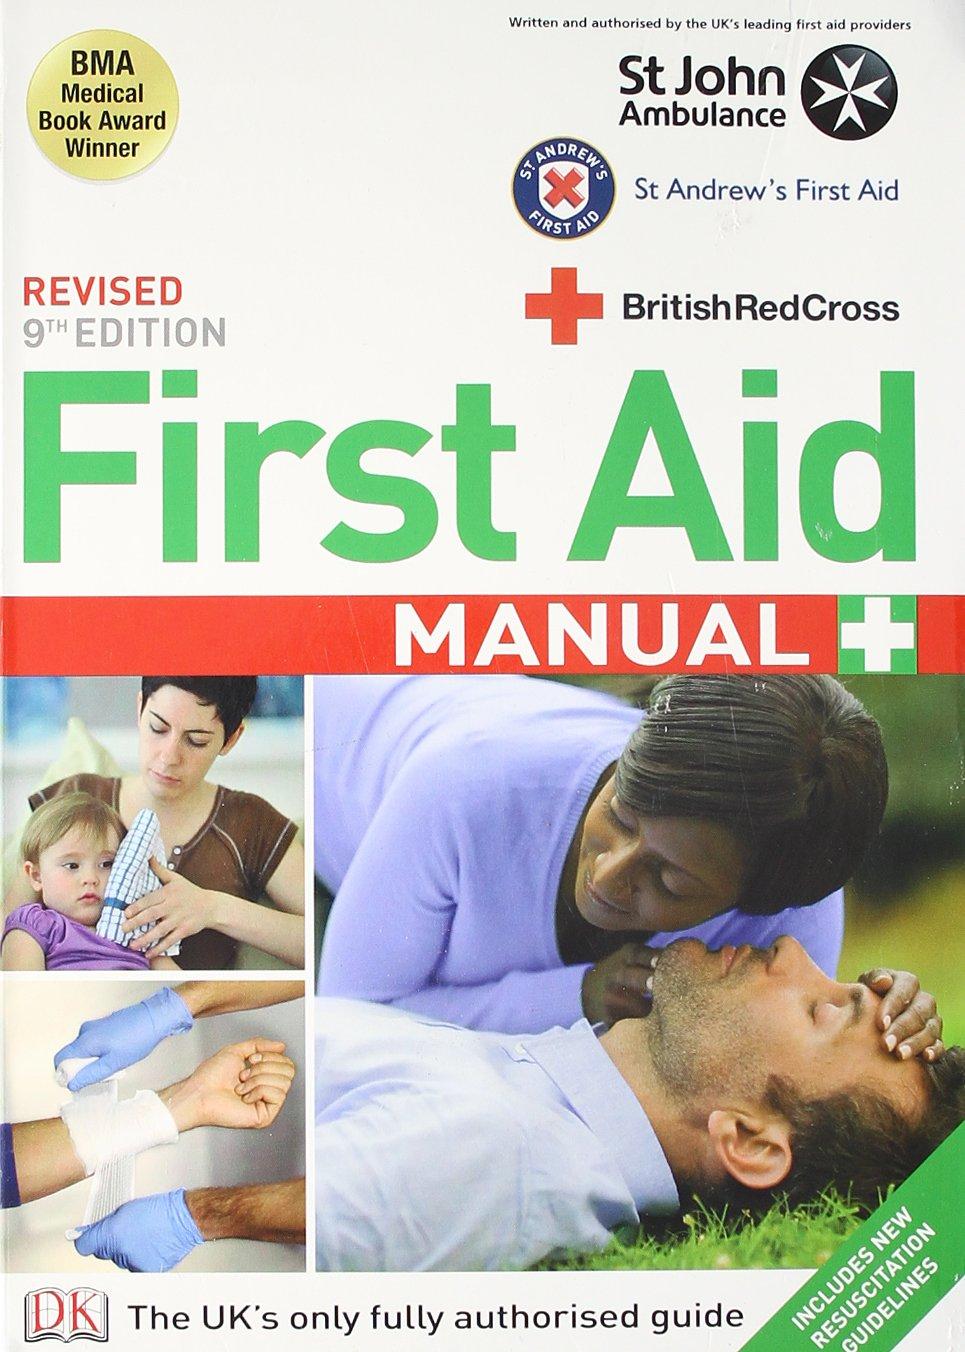 st john ambulance first aid manual pdf download